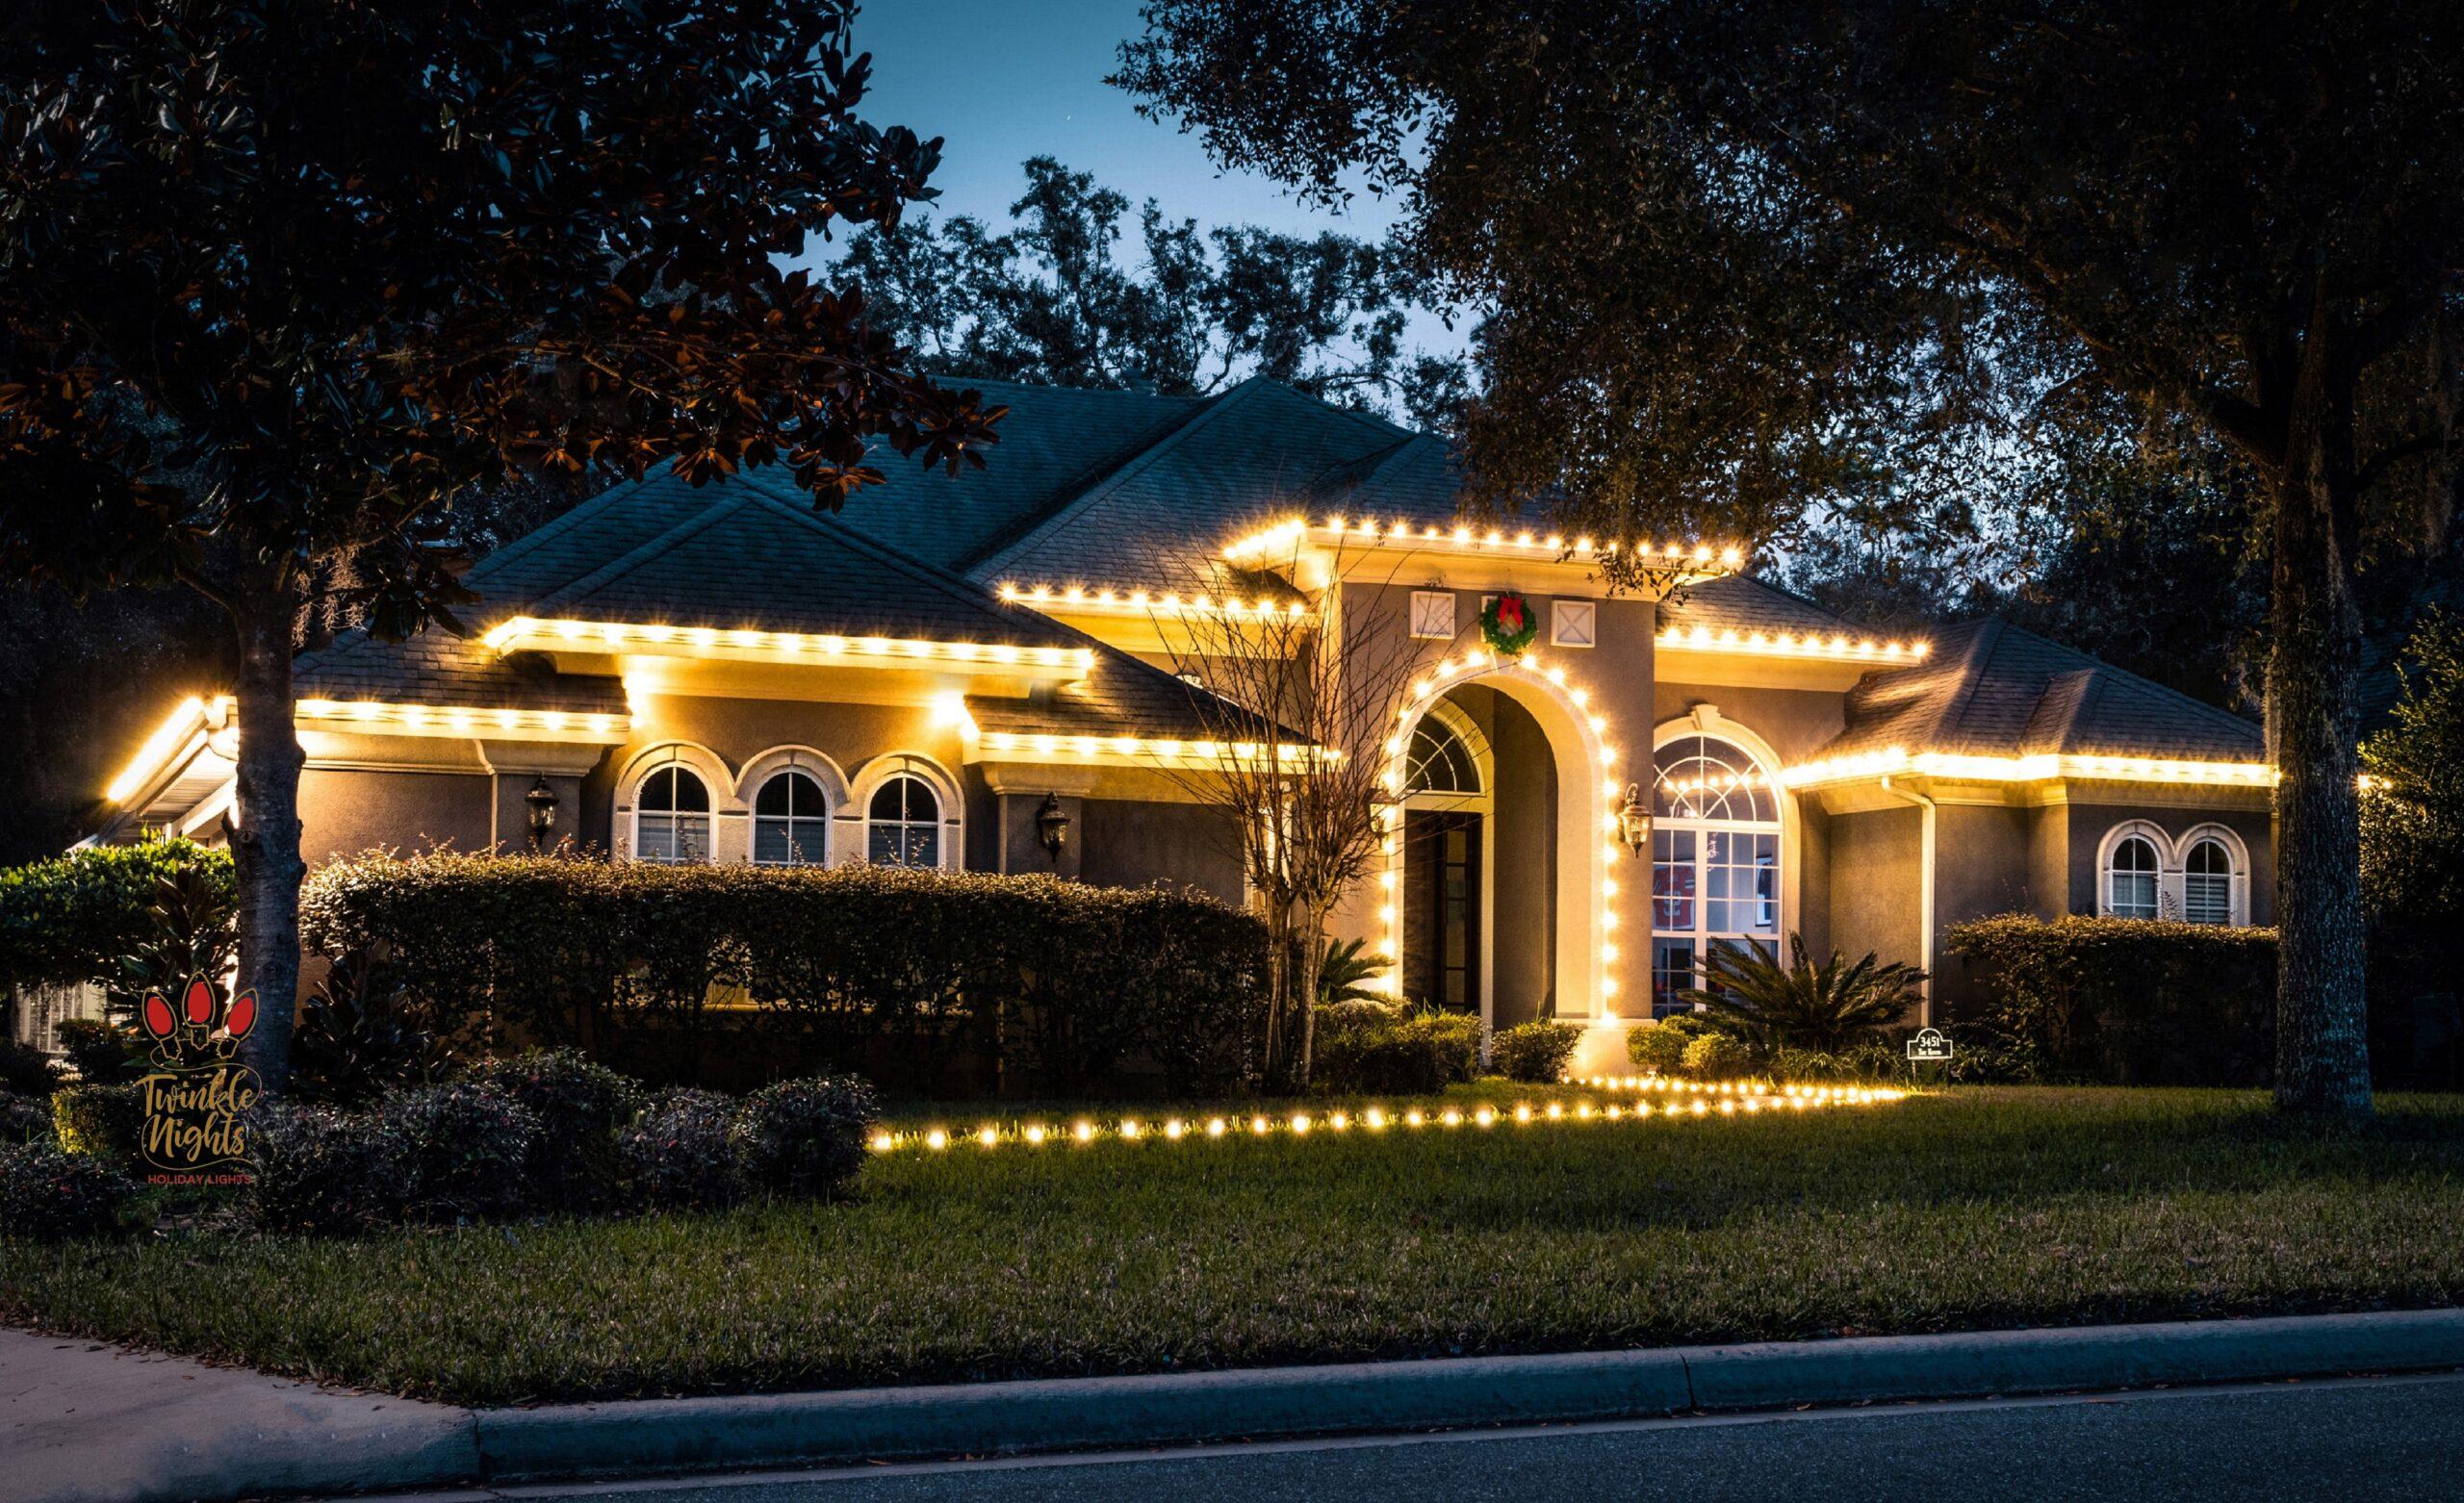 twinkle night holiday lights